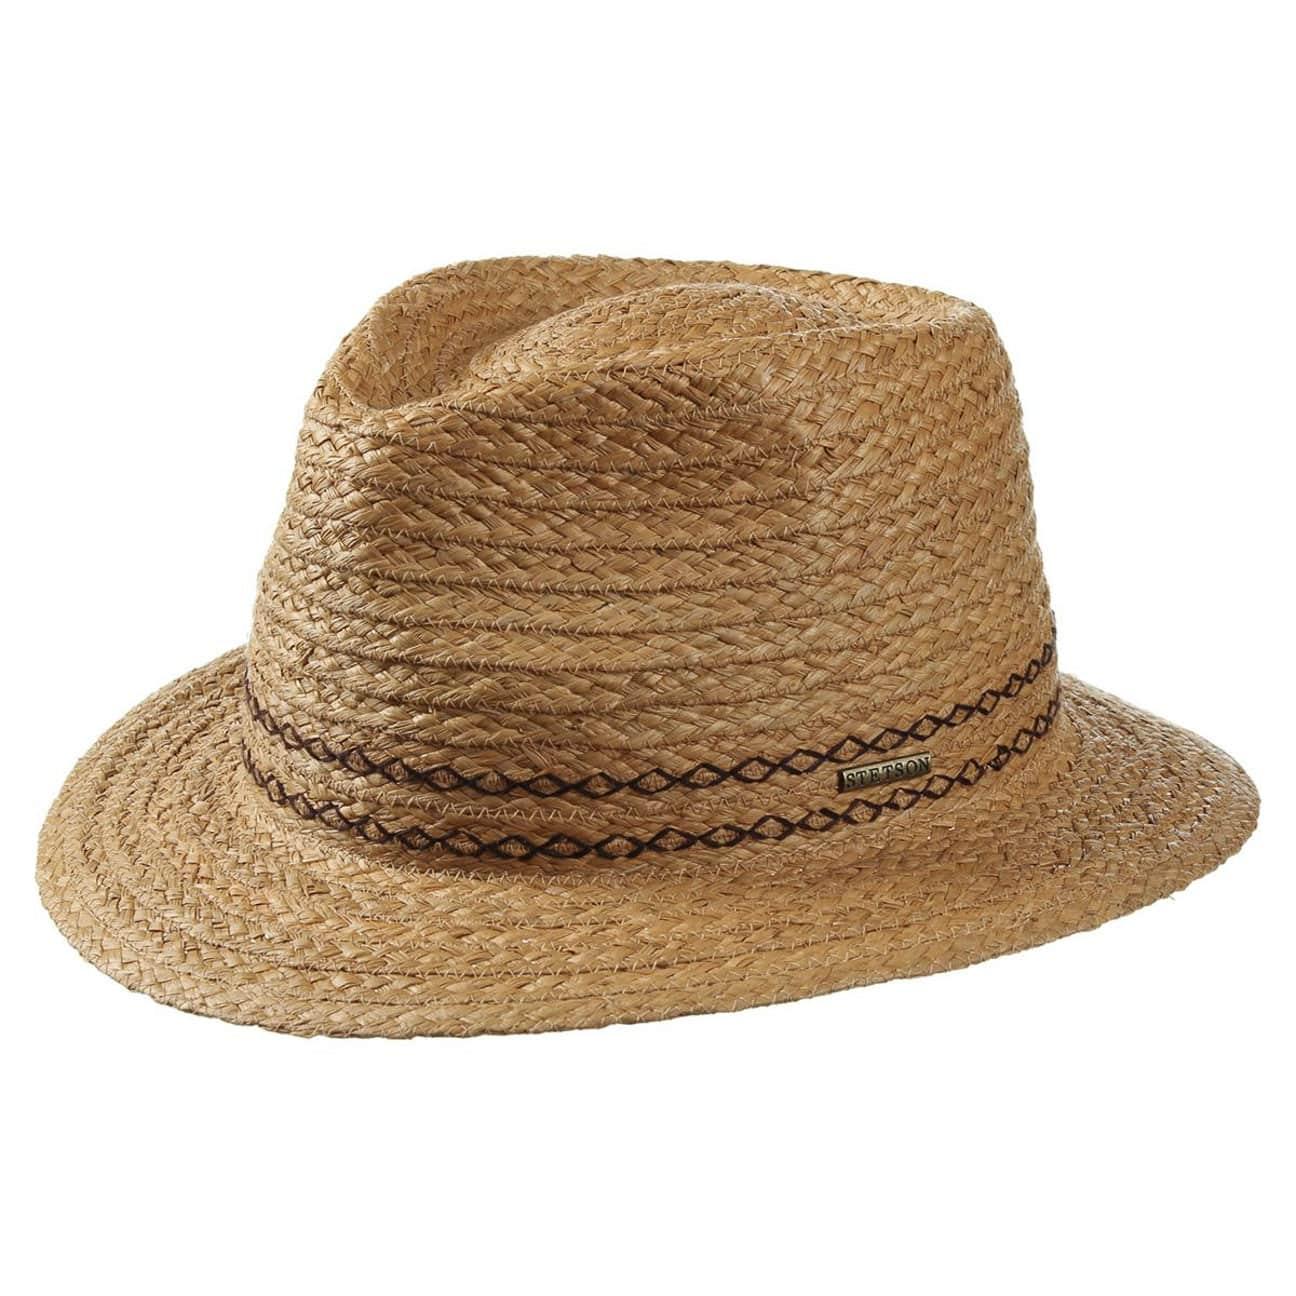 850b191b7ab12 ... Andover Raffia Straw Hat by Stetson - nature 1